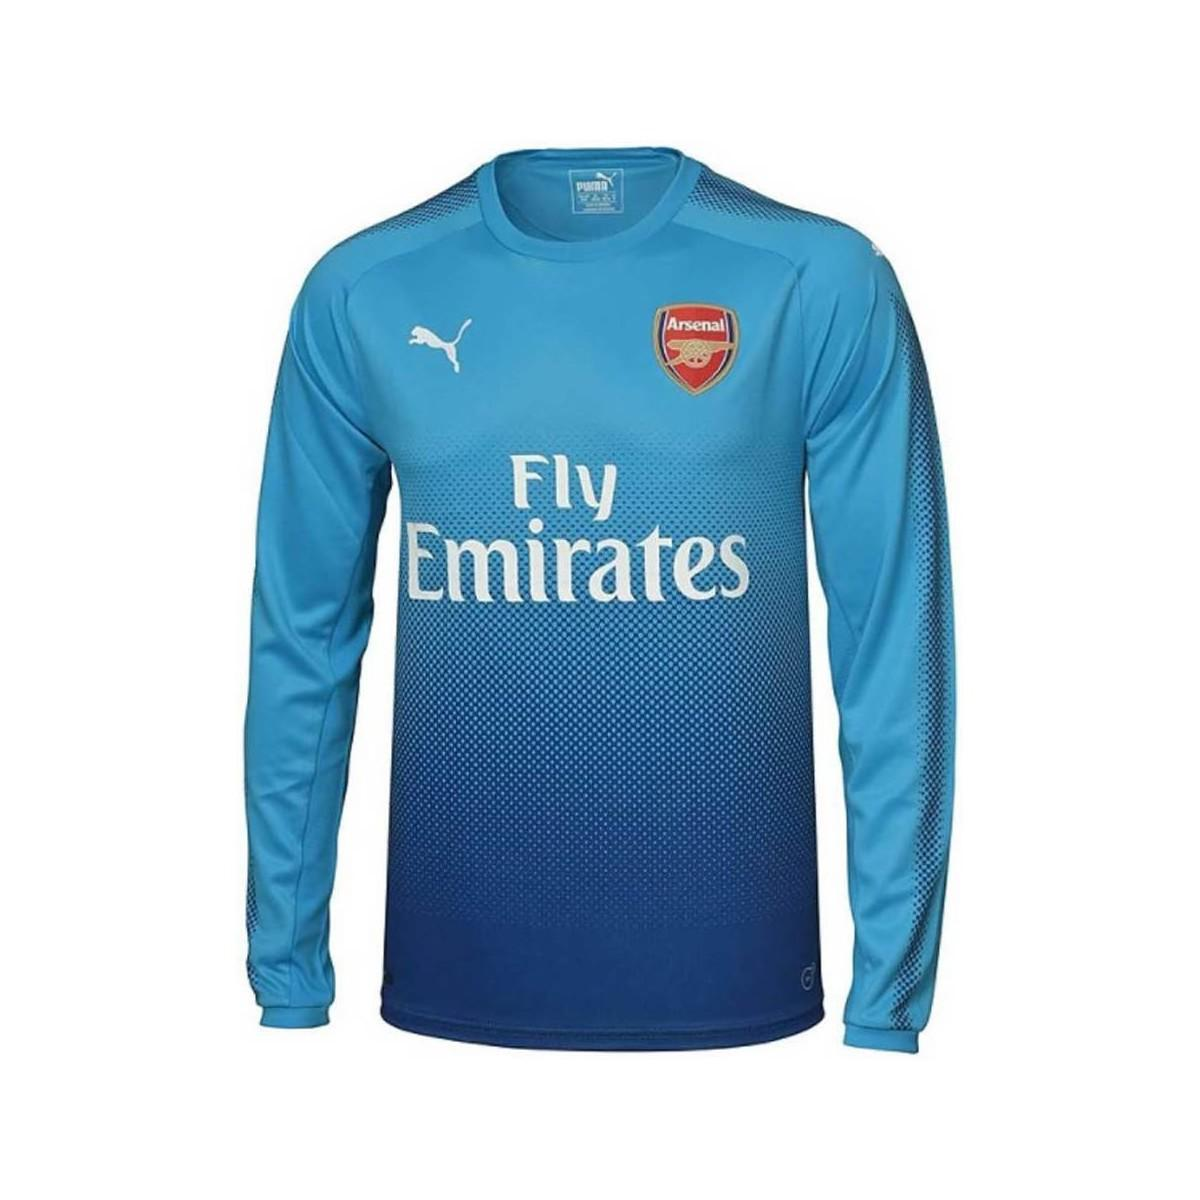 4942f93ea PUMA. 2017-2018 Arsenal Away Long Sleeve Shirt (koscielny 6) - Kids Women s  In Blue